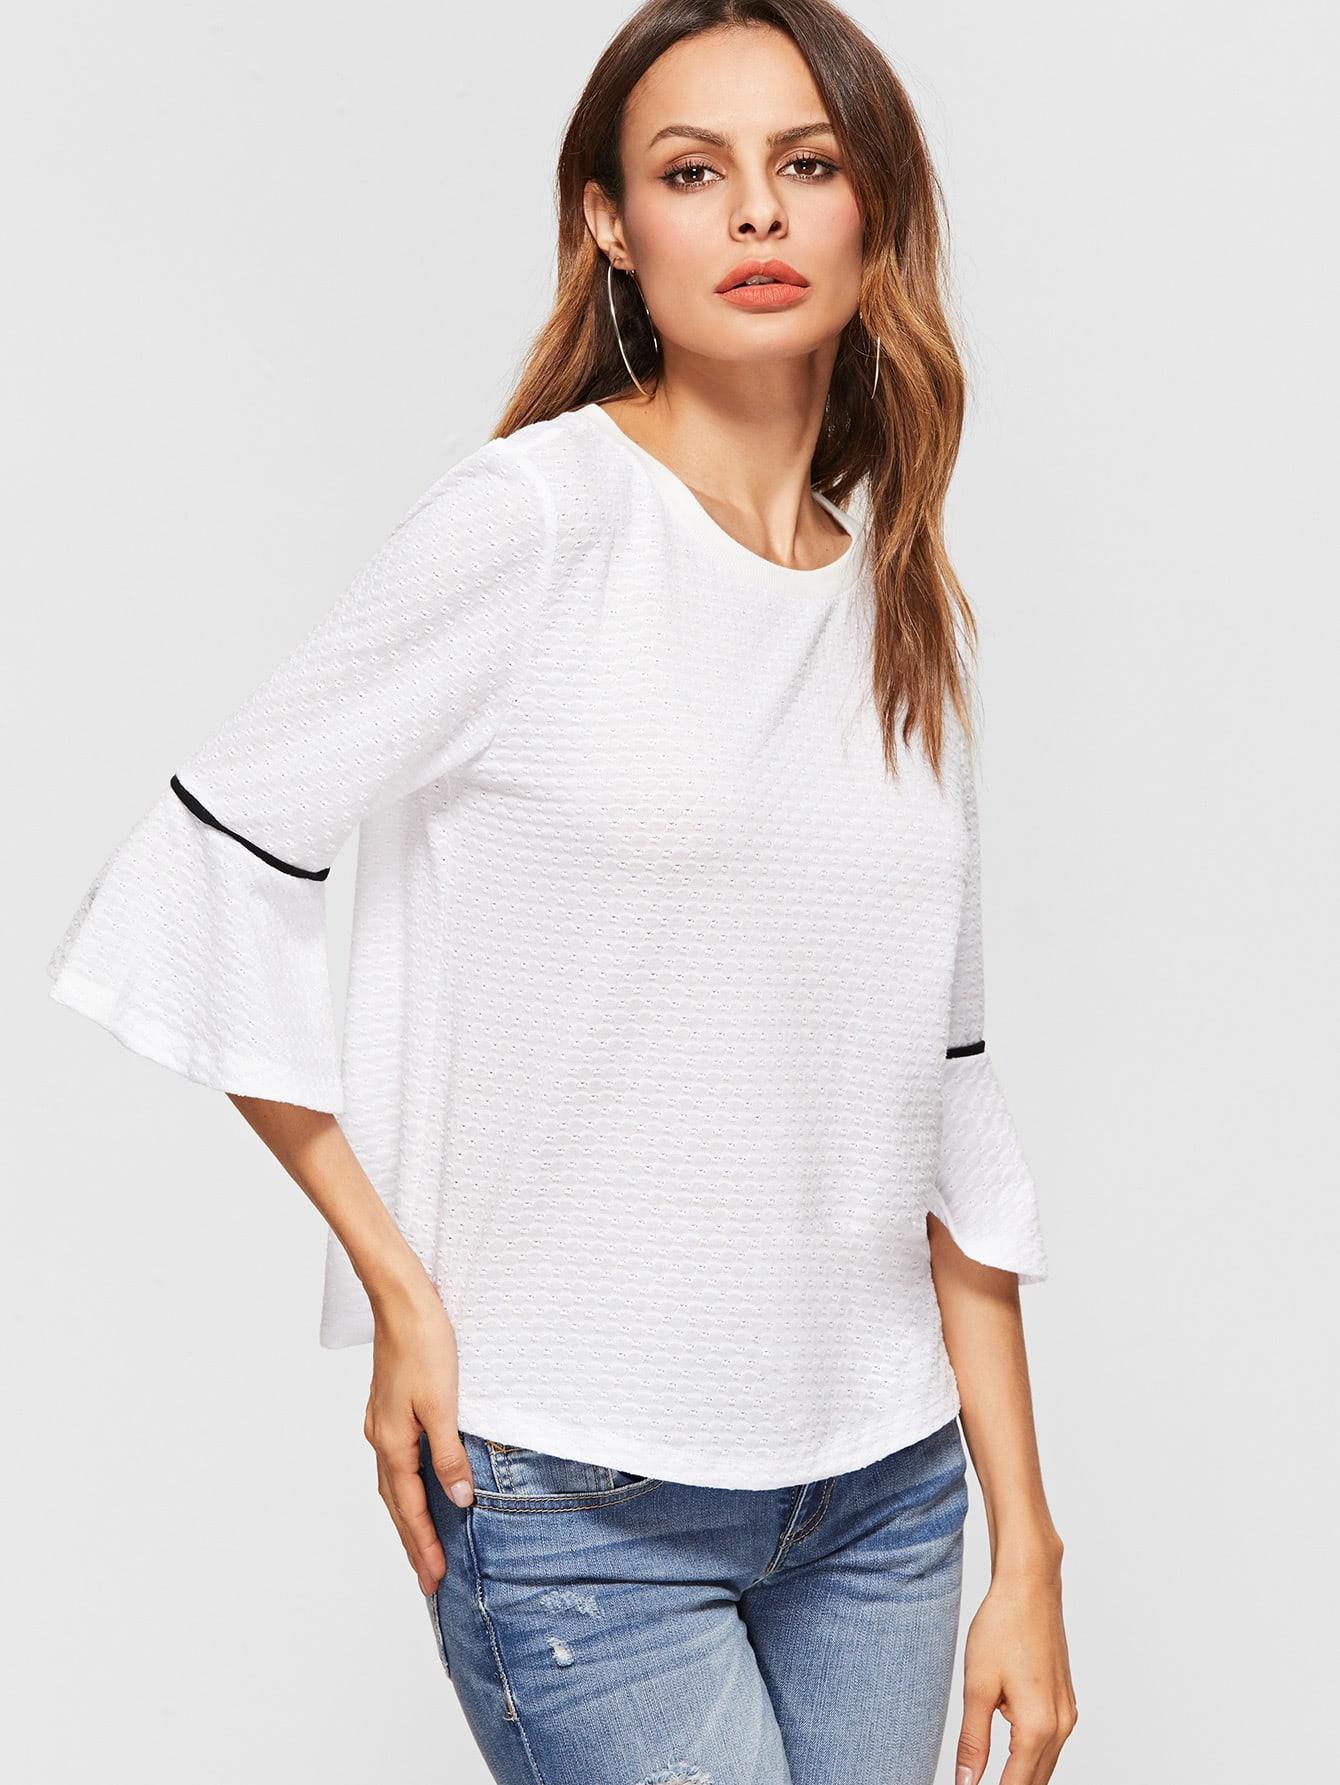 blouse161206471_2